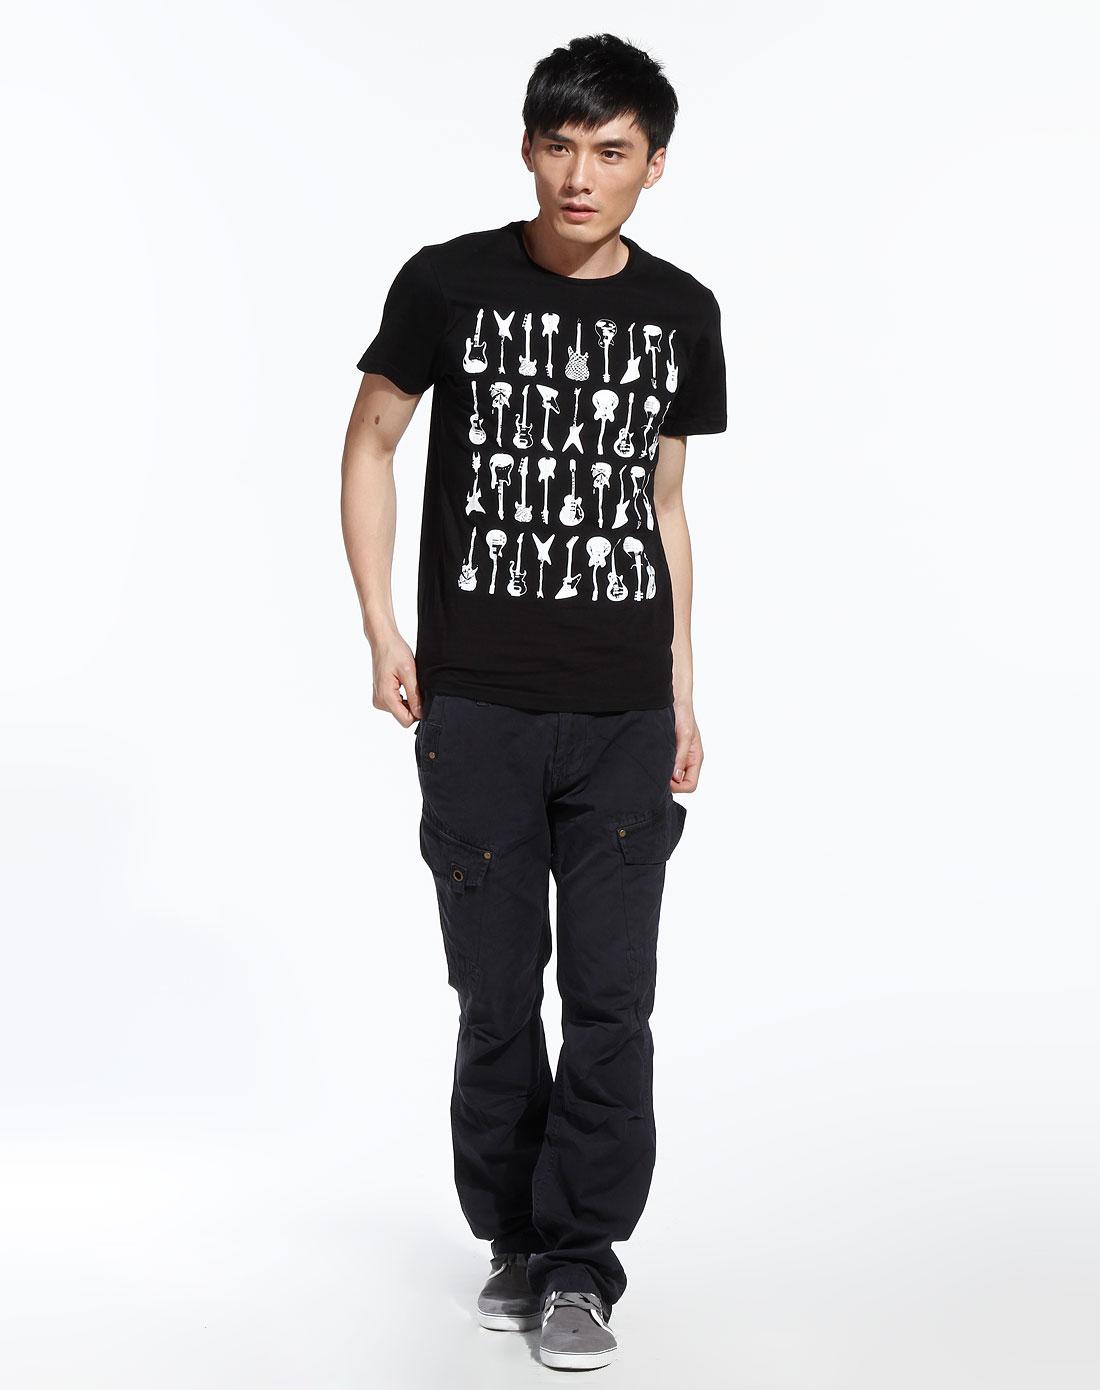 fox-男 黑/白色个性图案短袖t恤